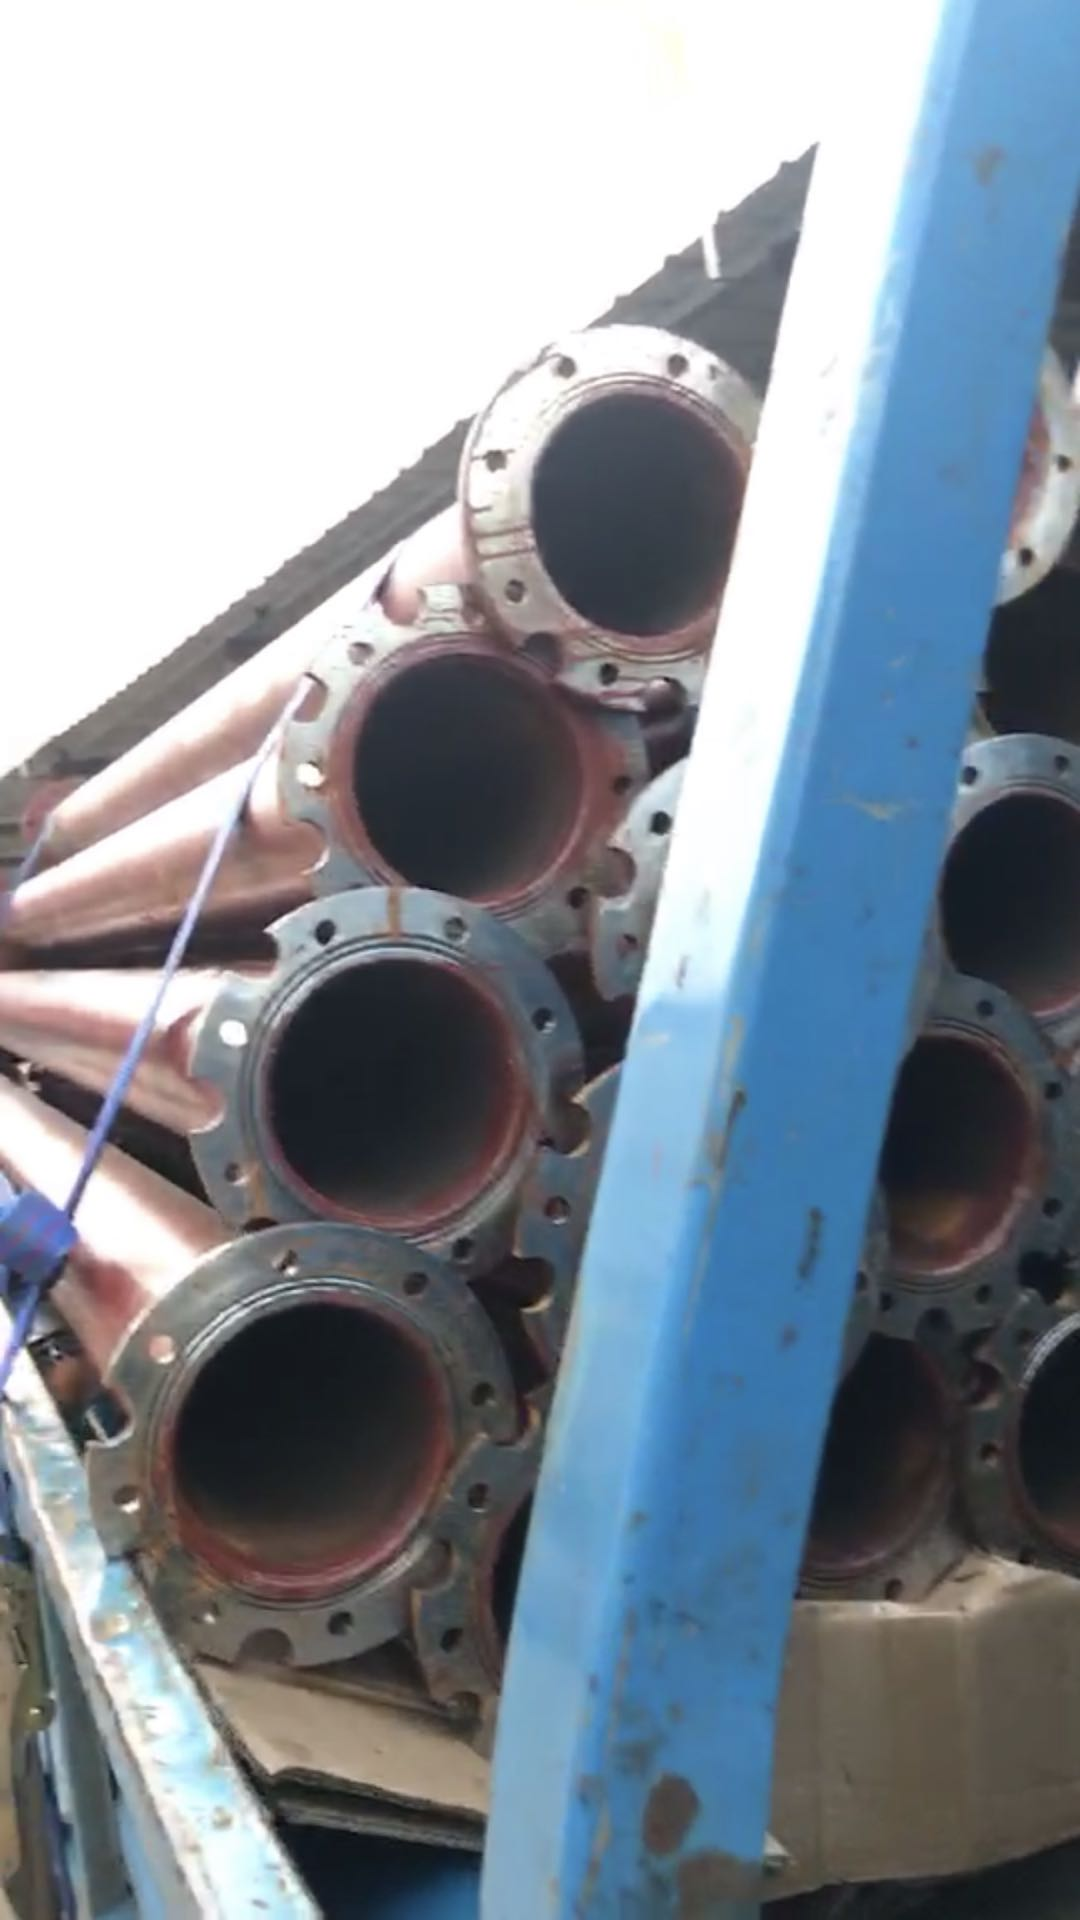 250QJR耐高温热水泵及无缝管安装现场走起第2张-潜水电机-潜水电泵-高压潜水电机-天津潜成泵业